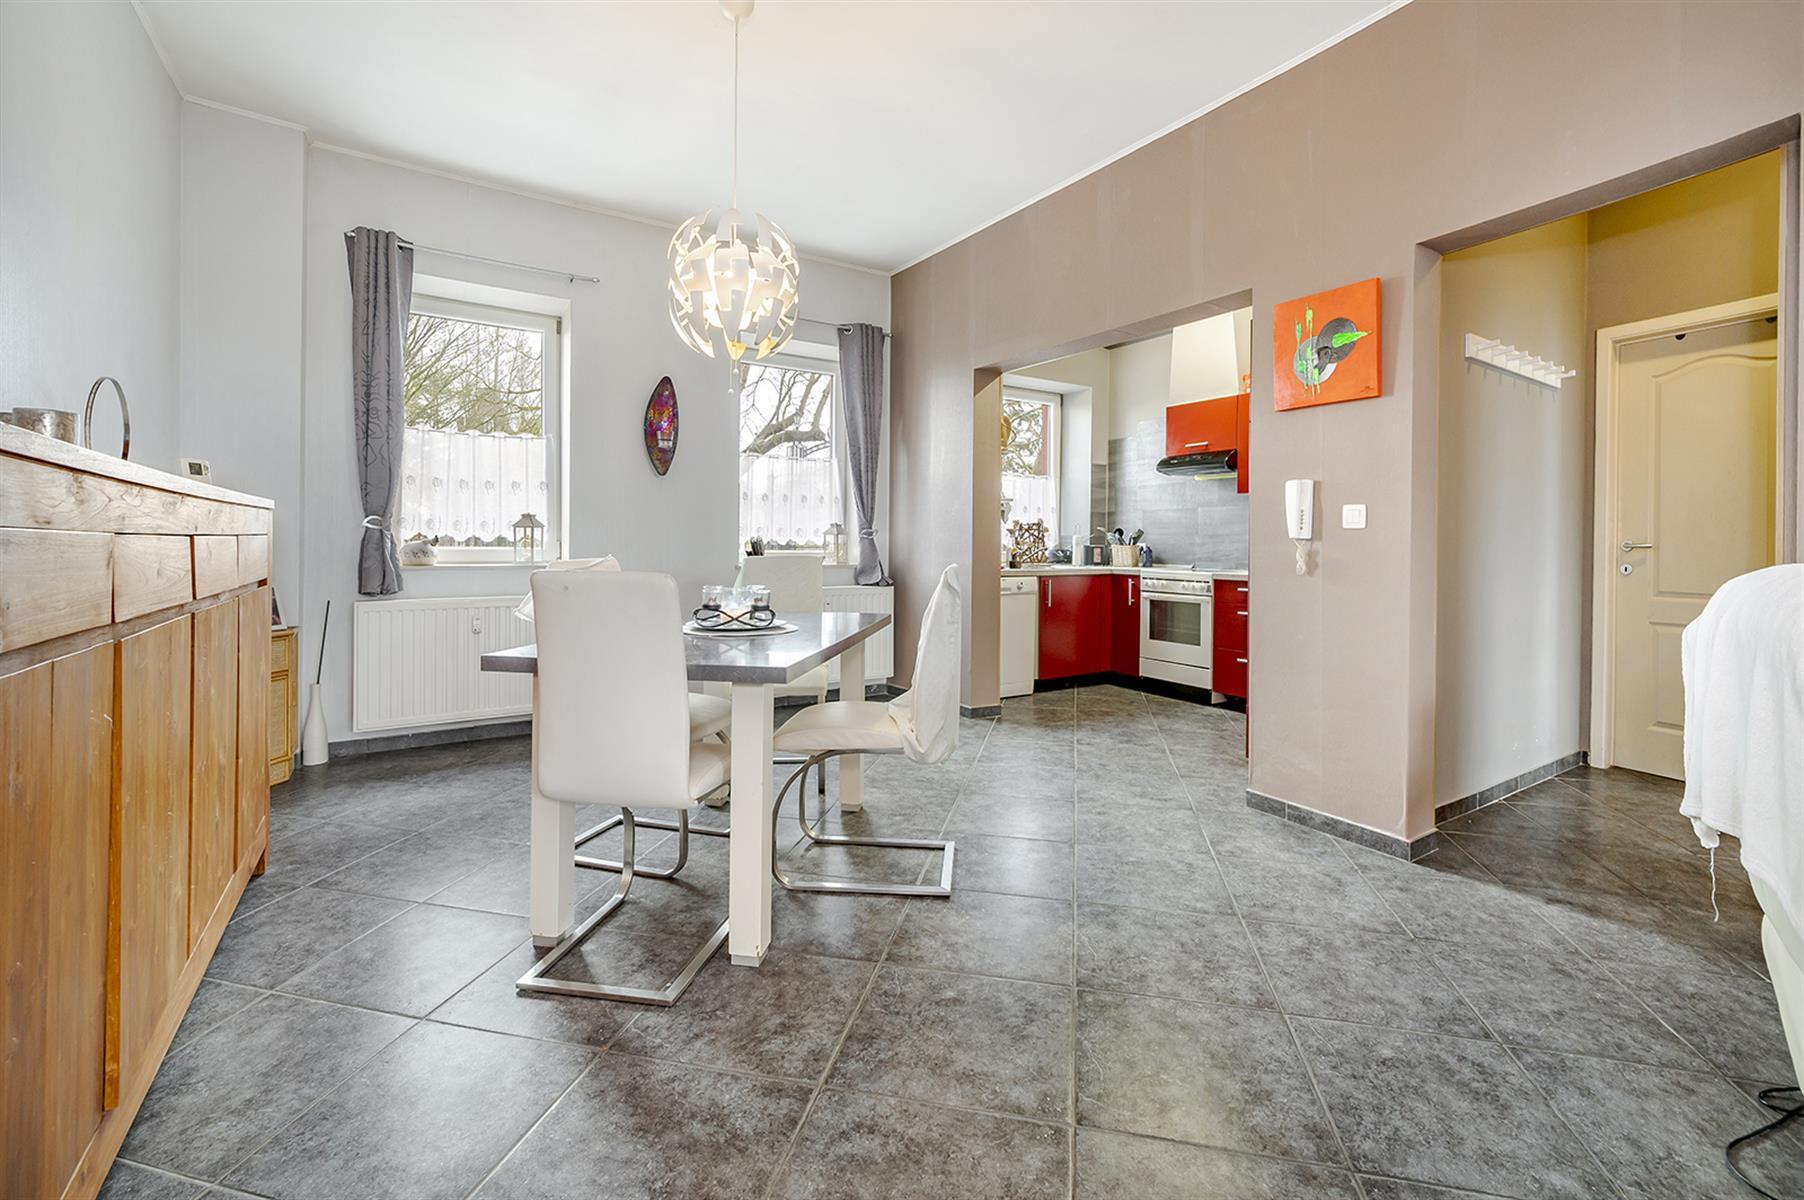 Appartement - Donceel - #3955564-1